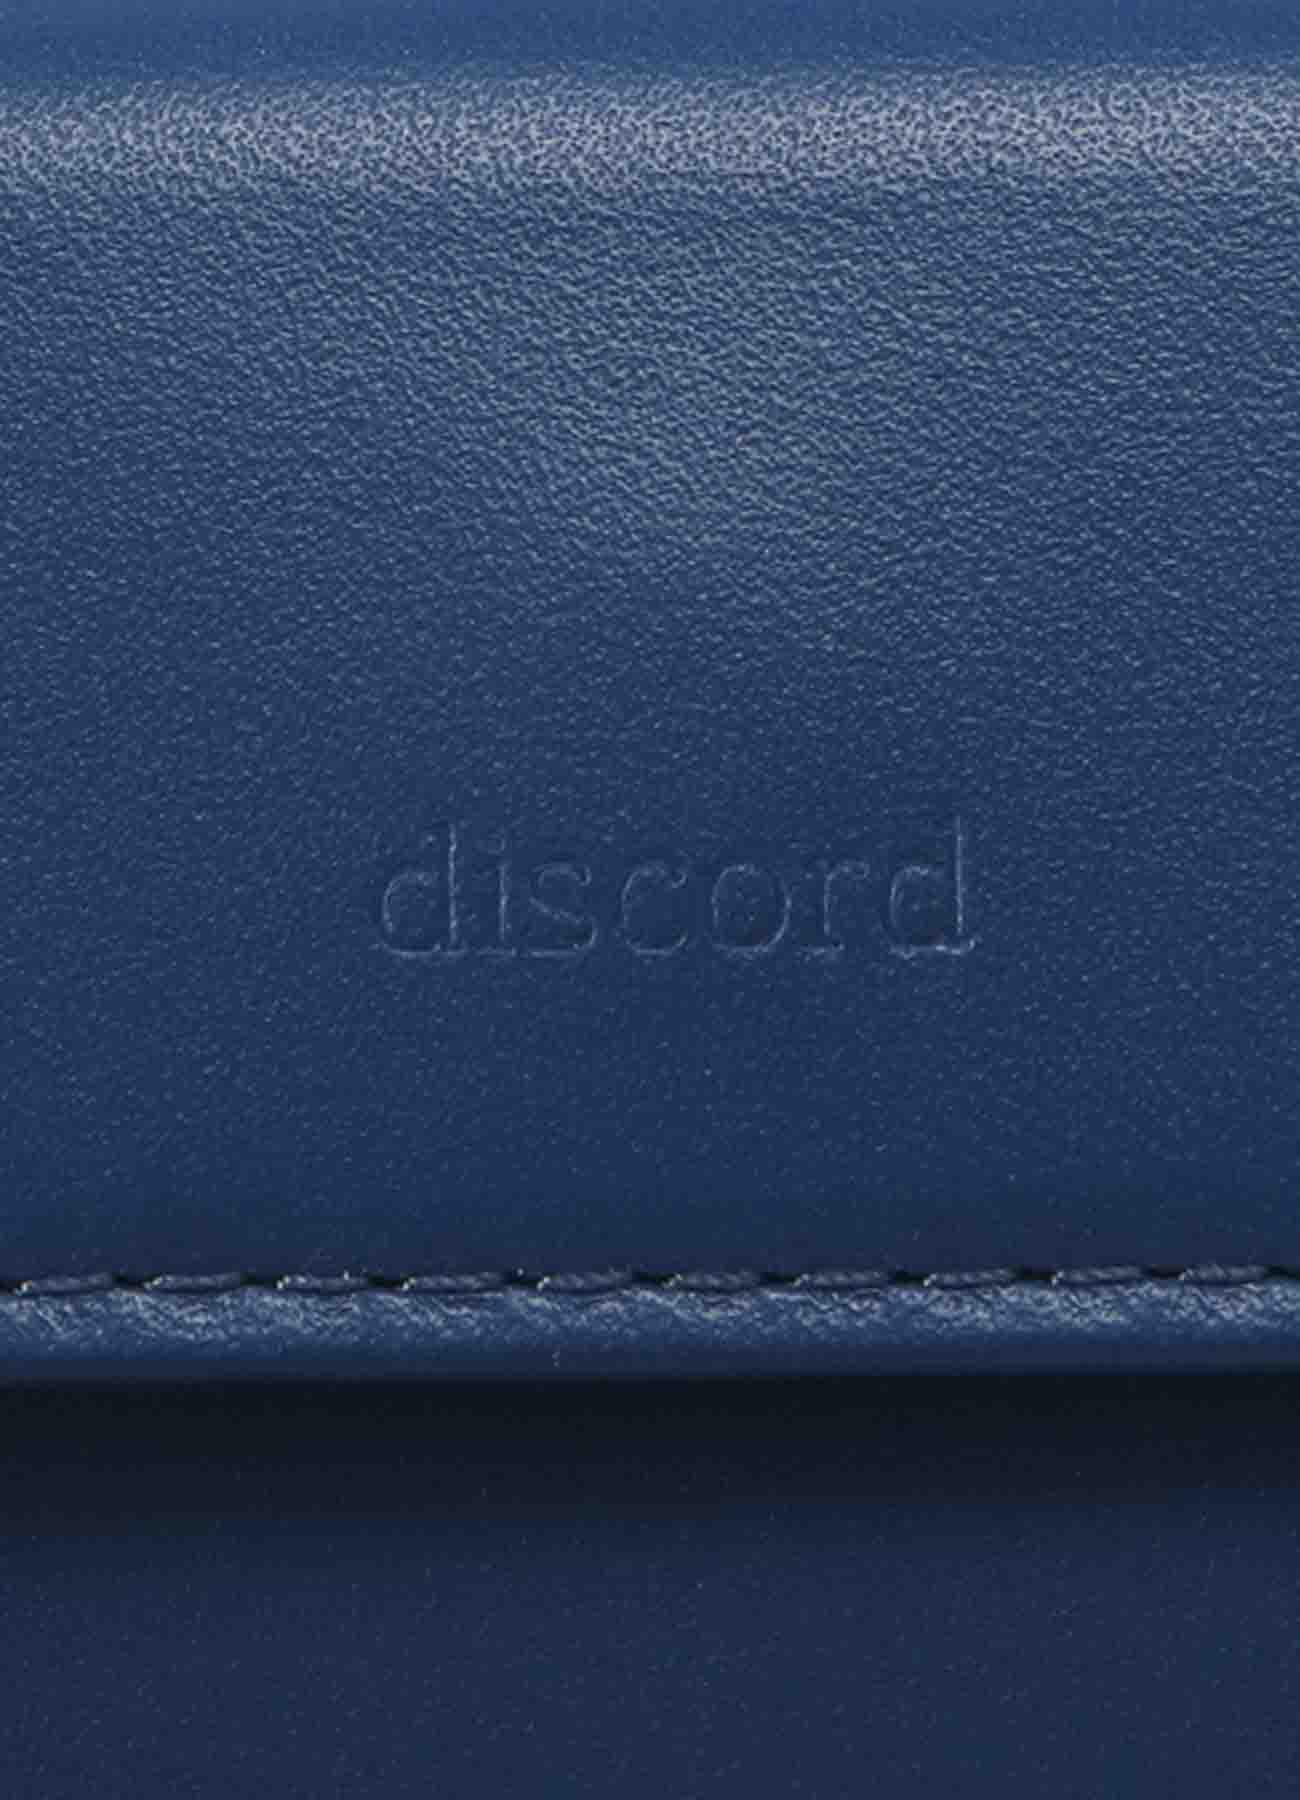 Plain(short wallet)